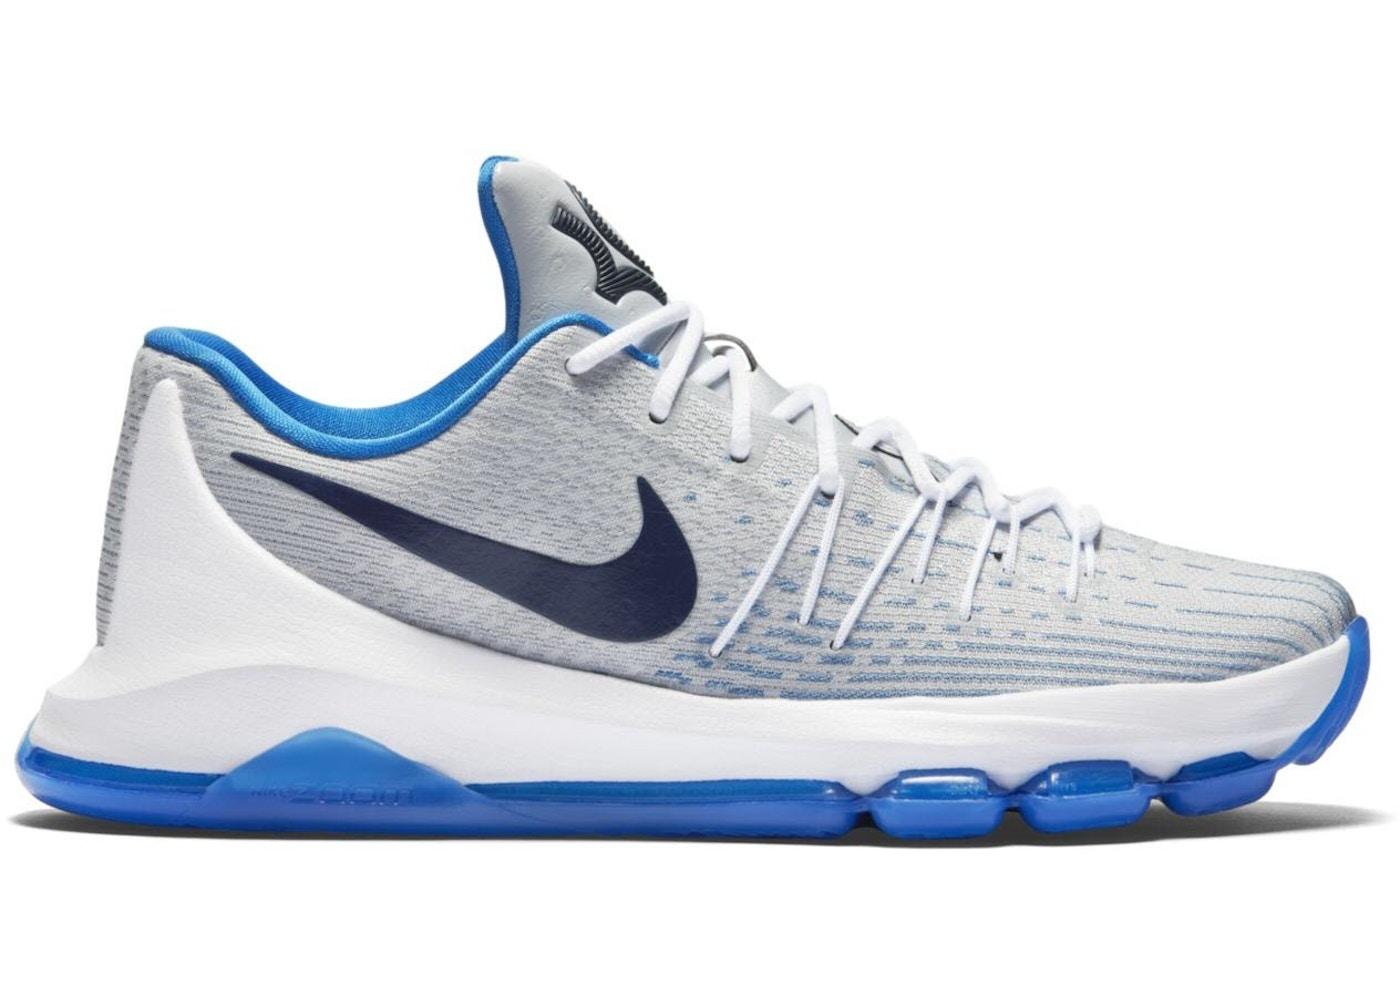 online store ea0f6 1c153 Nike KD 8 Shoes - Average Sale Price